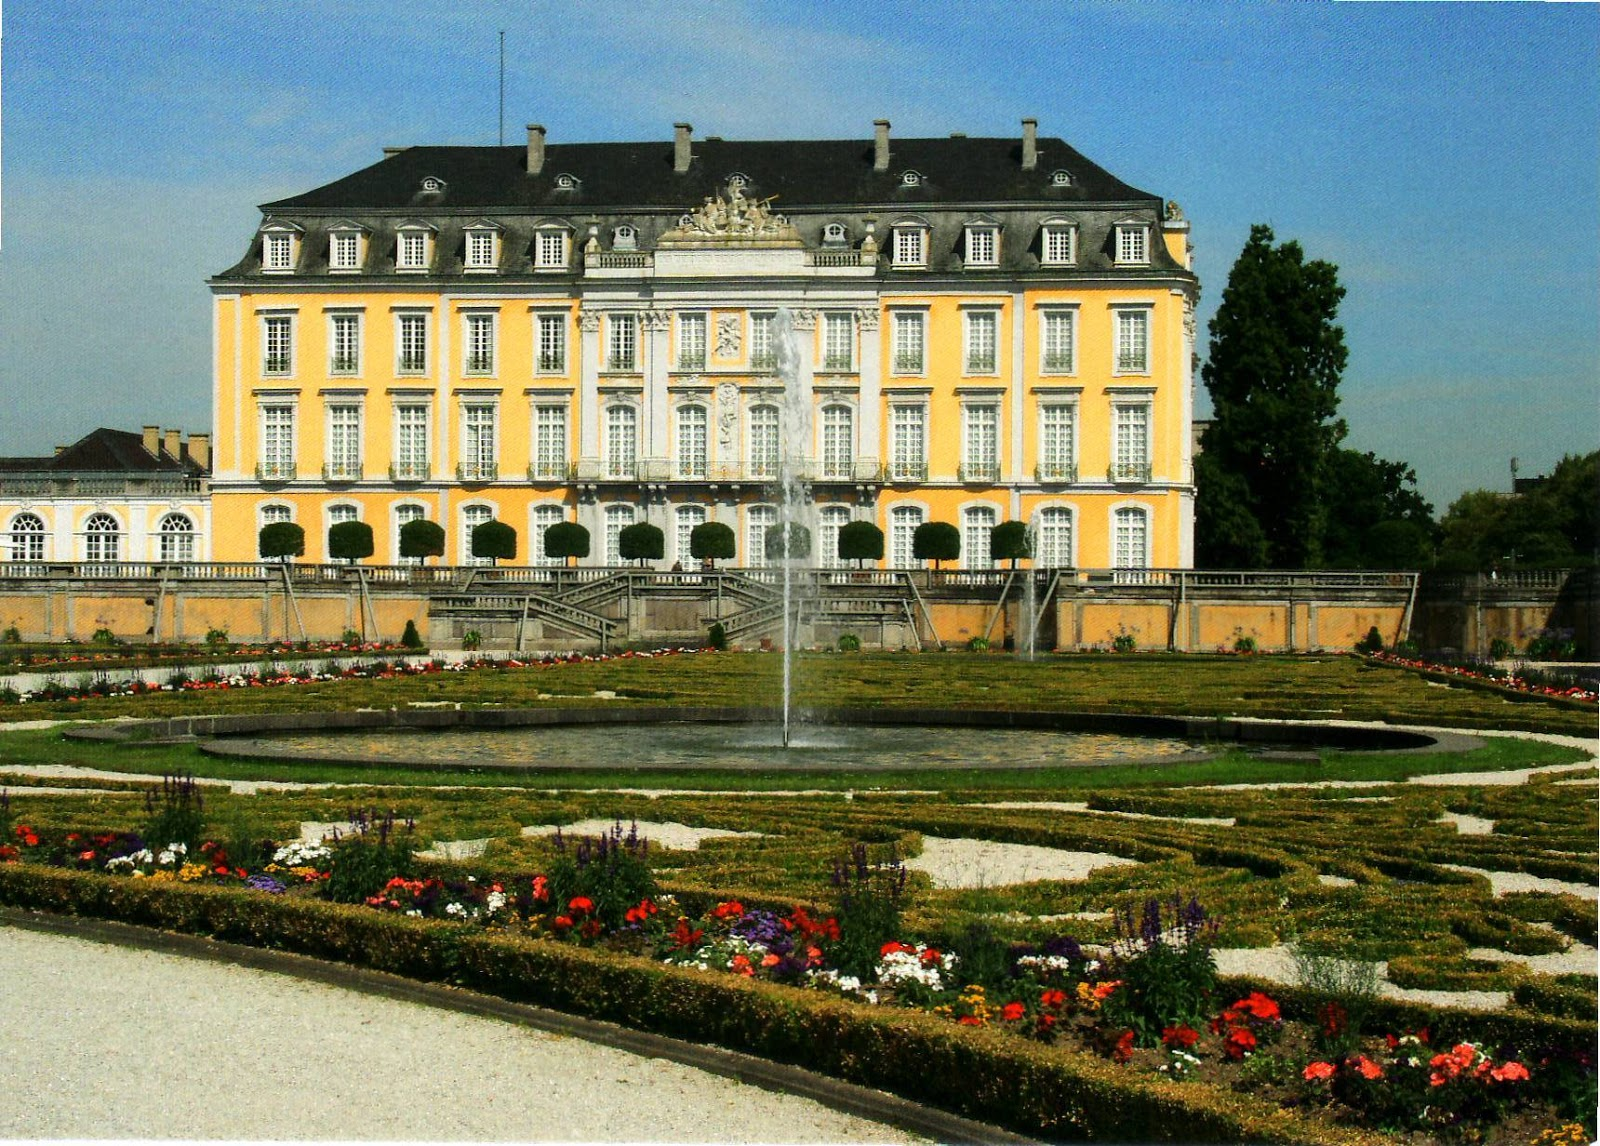 augustusburg castle germany wallpapers - Wallpaper augustusburg castle germany Wallpapers HD